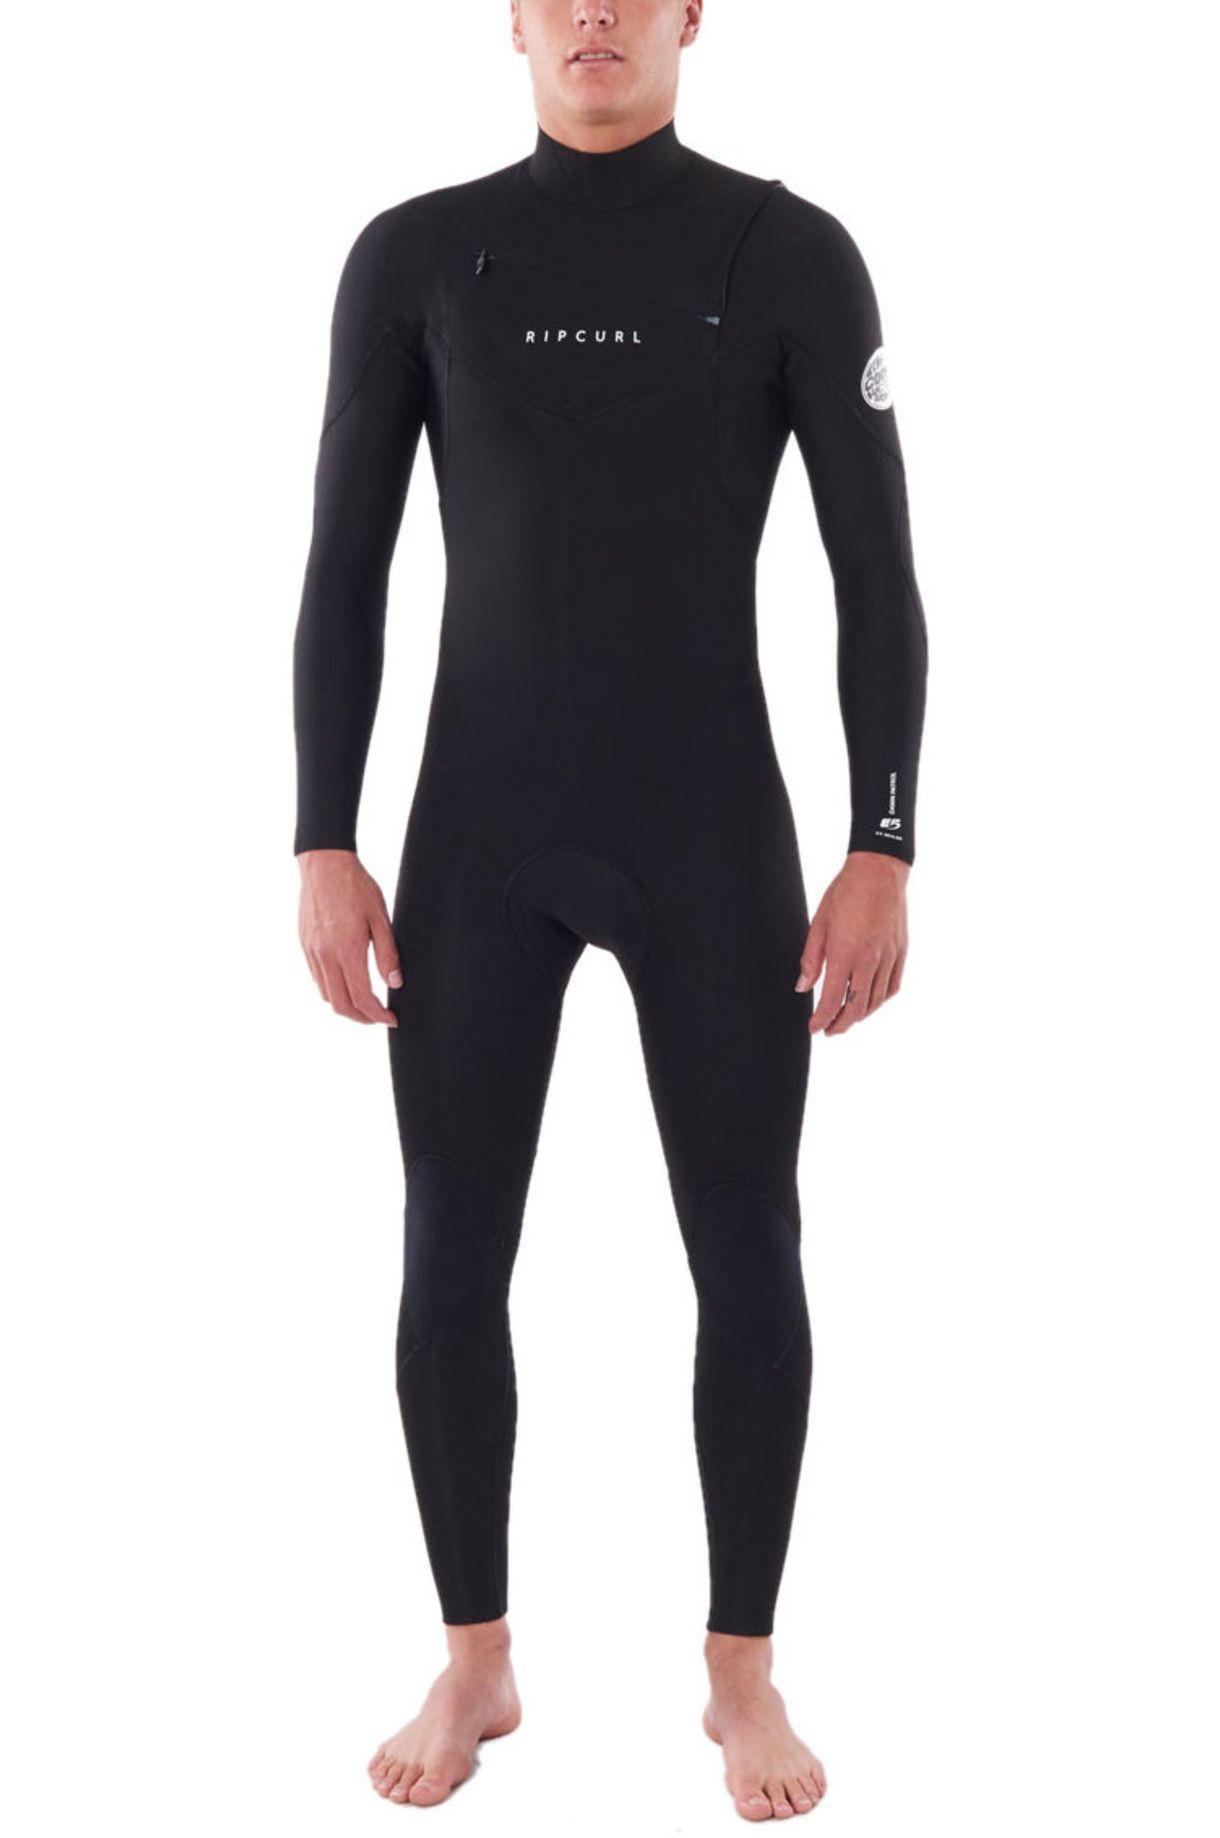 Rip Curl Wetsuit DAWN PATROL PERFORMANCE 43 GB CZ Black 4x3mm